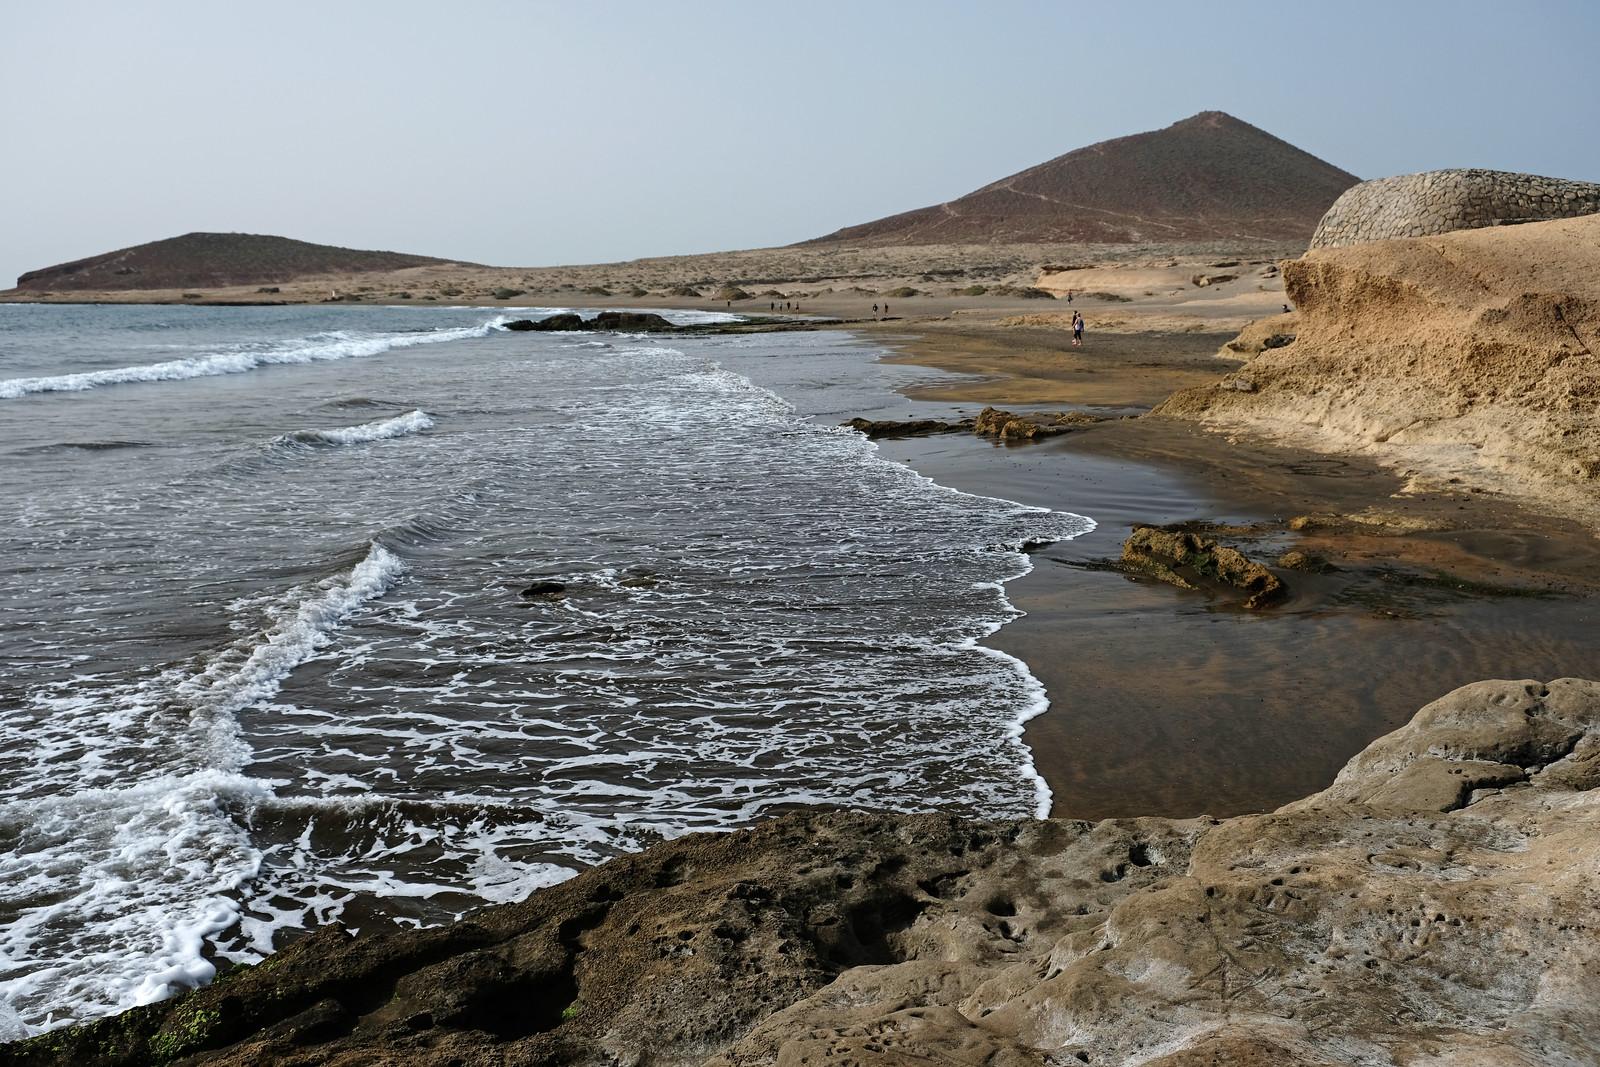 Playa el Médano, Tenerife, Canary Islands, Spain